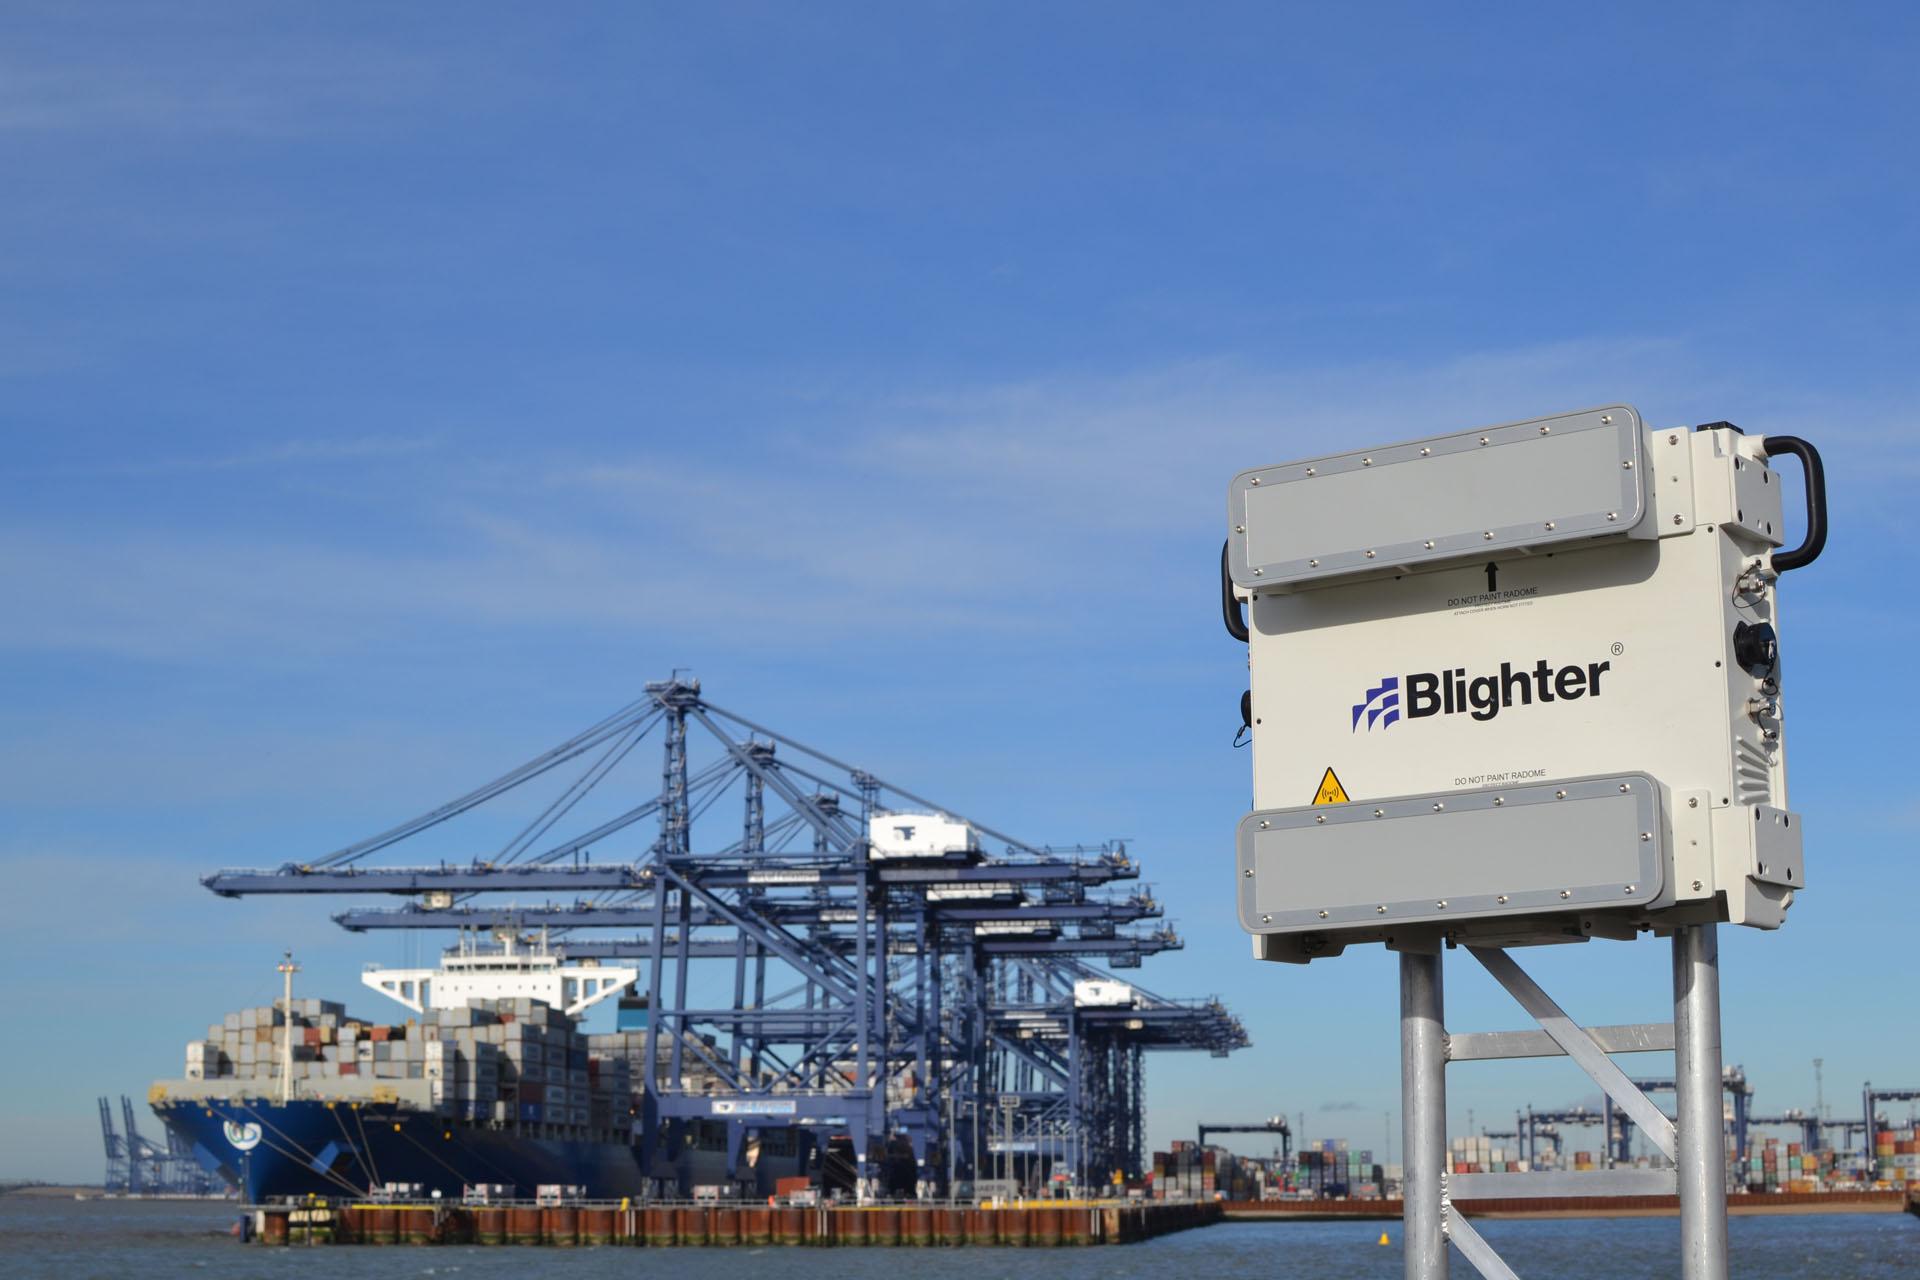 Blighter 39 s solid state doppler coastal security radar for Coastal burglar alarm